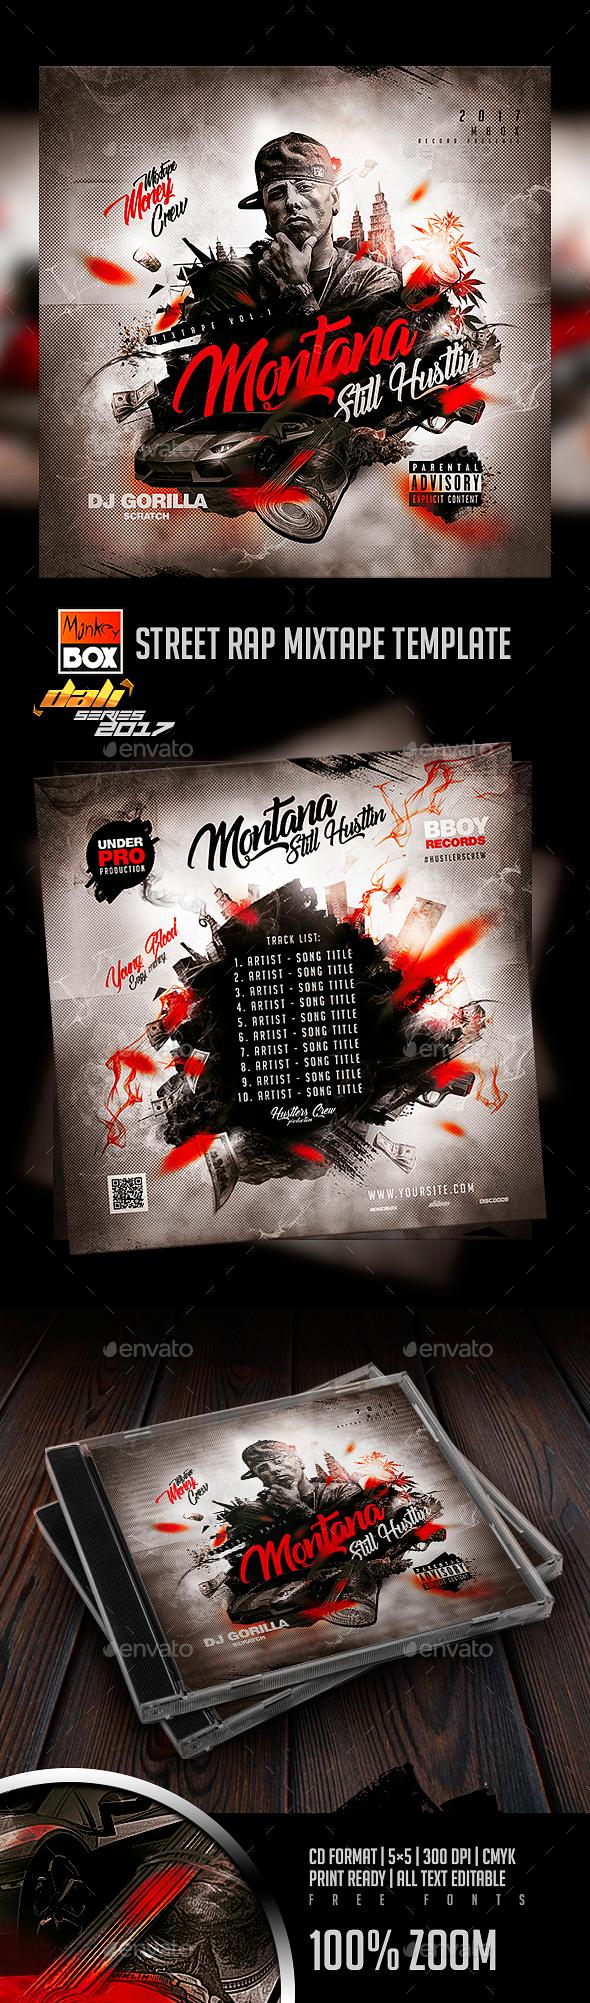 GraphicRiver Street Rap Mixtape Template 20586029